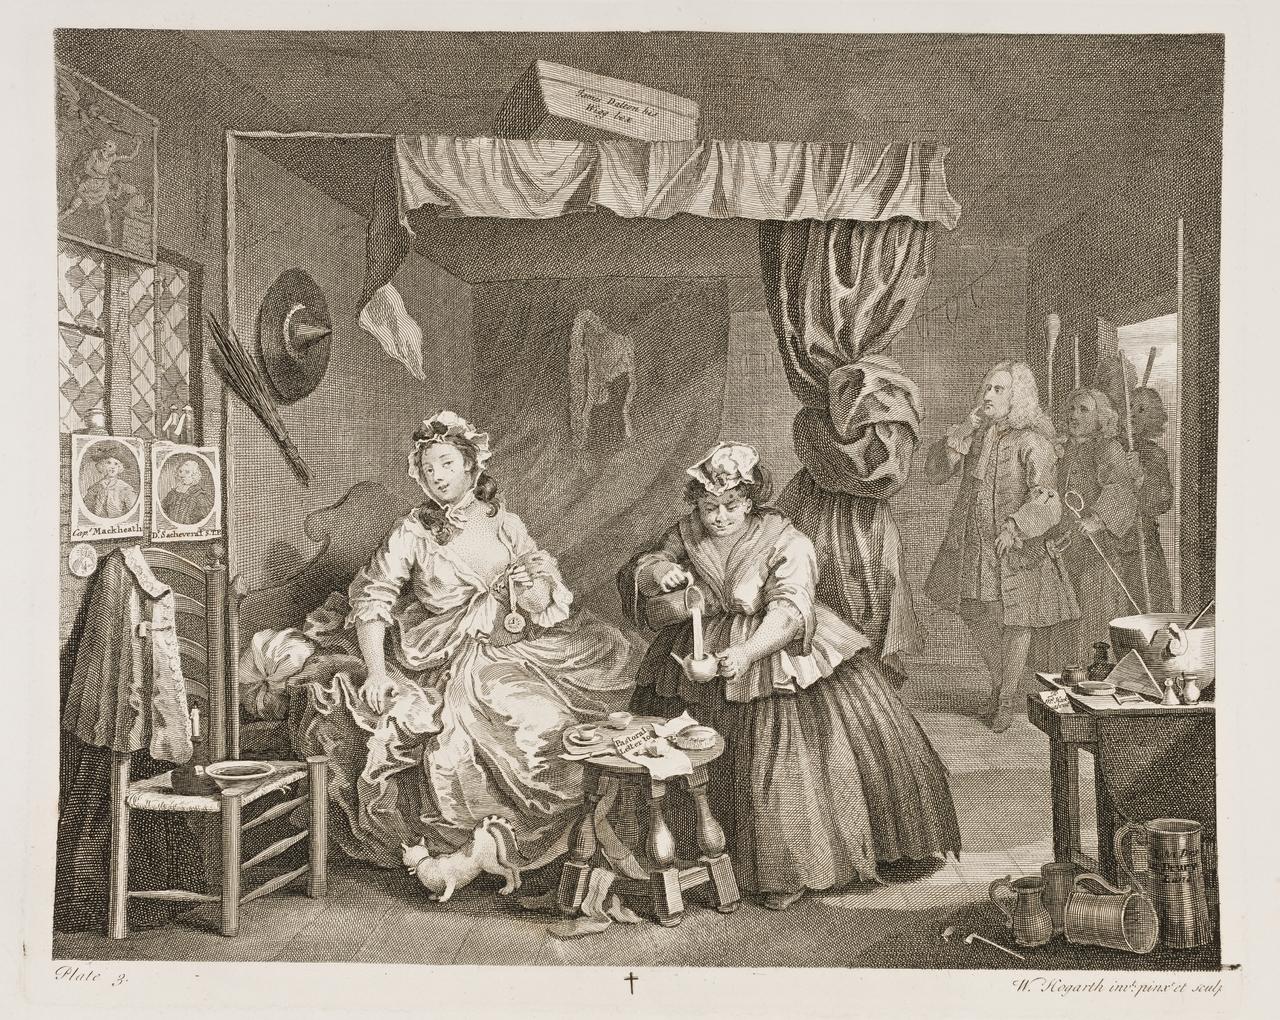 William Hogarth: A Harlot's Progress, Plate 3.